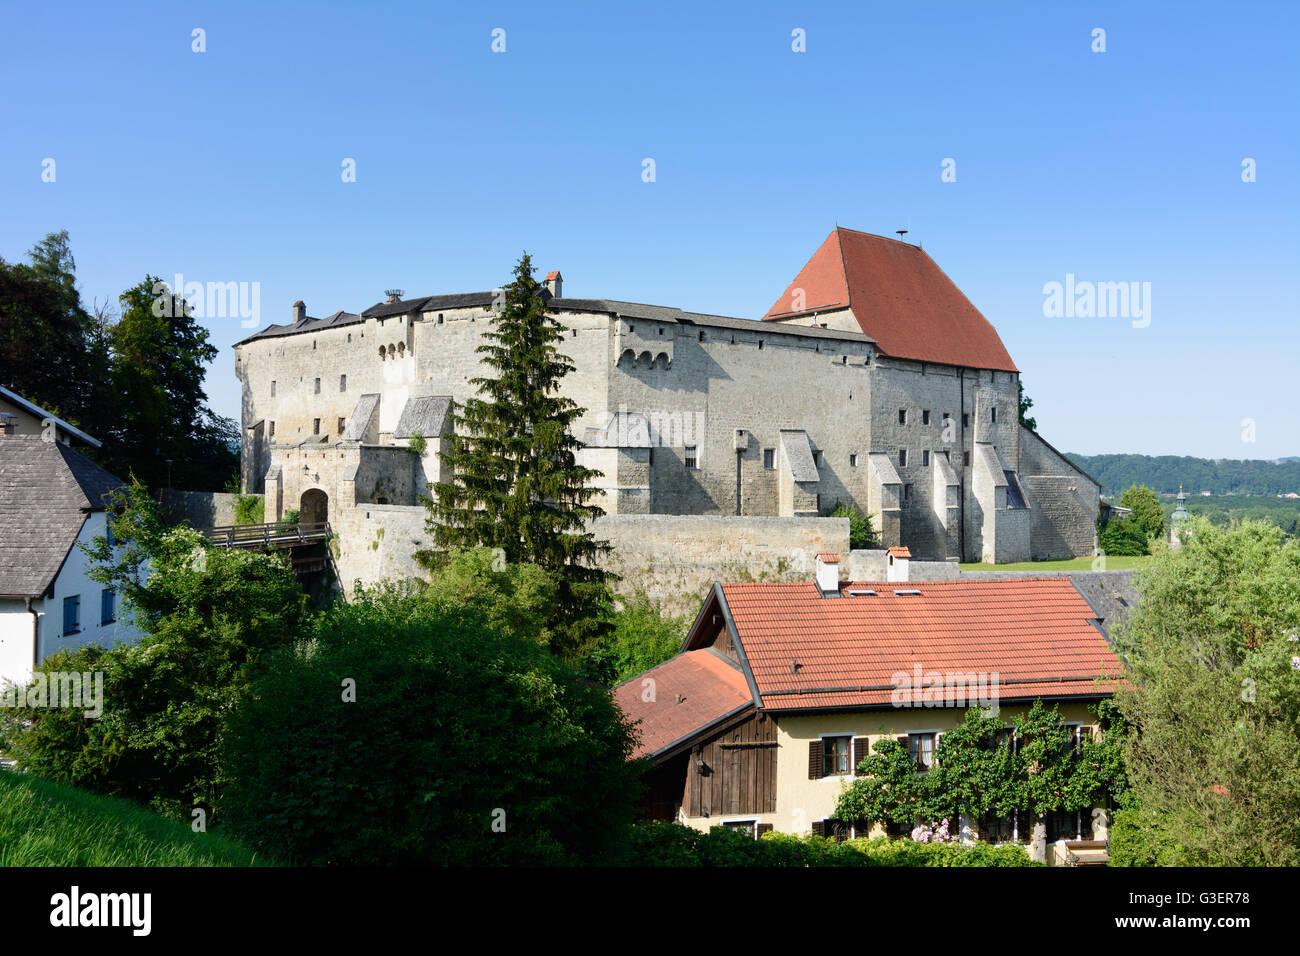 castle, Germany, Bayern, Bavaria, Oberbayern, Rupertiwinkel, Upper Bavaria, Tittmoning - Stock Image